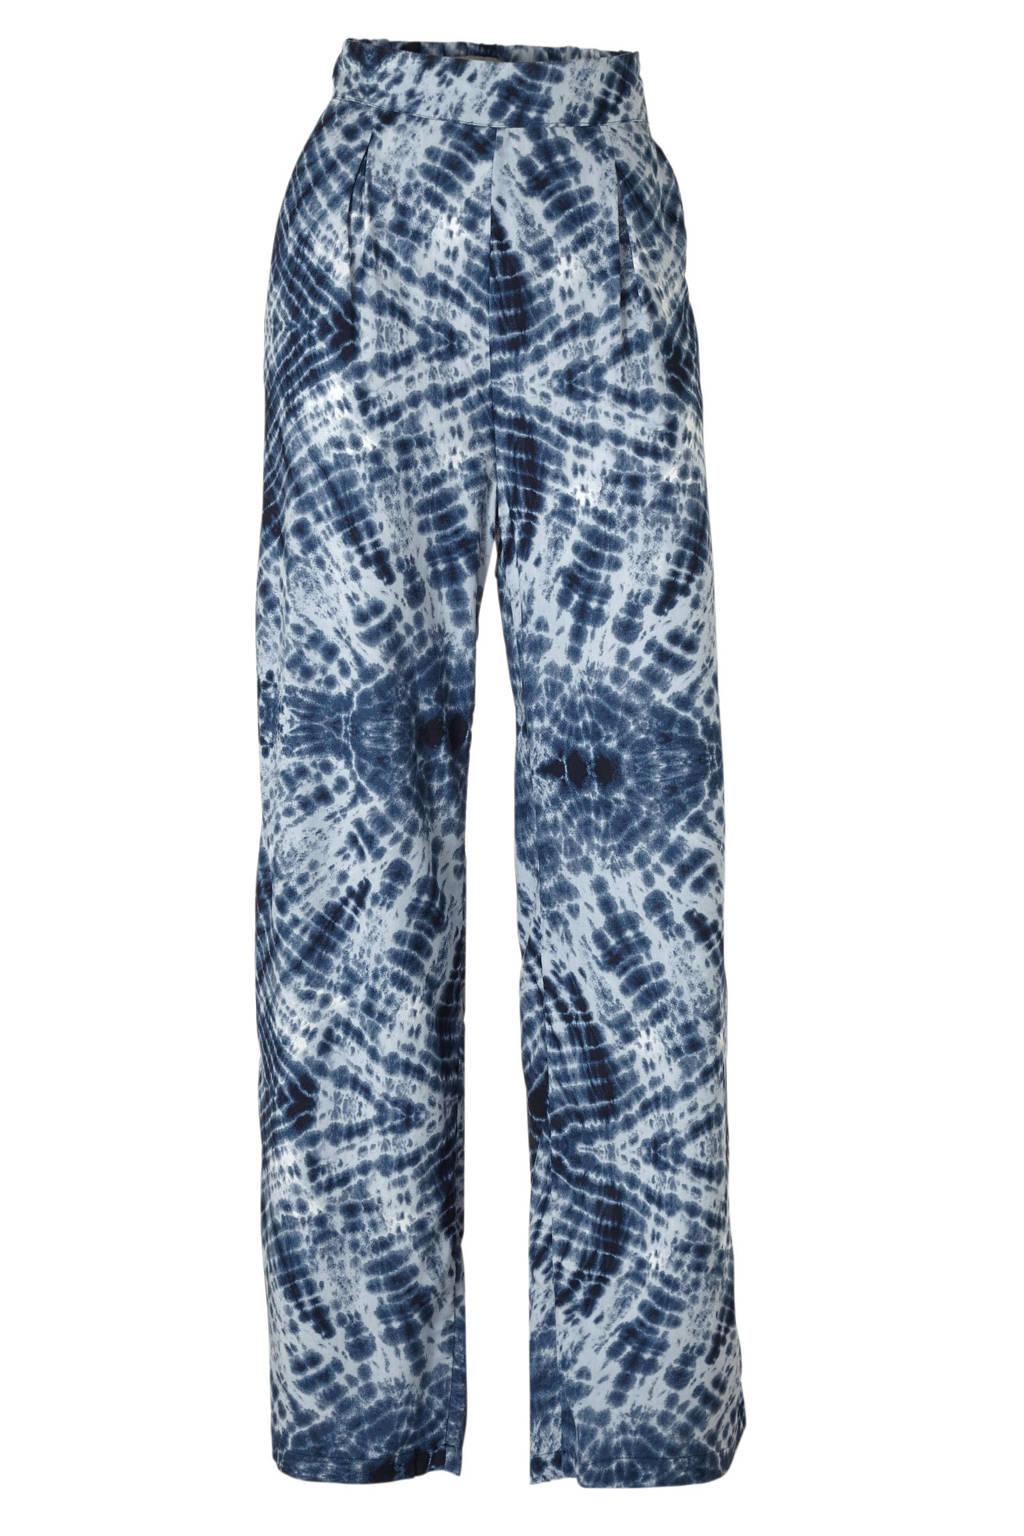 C&A Clockhouse straight fit broek met all over print blauw, Blauw